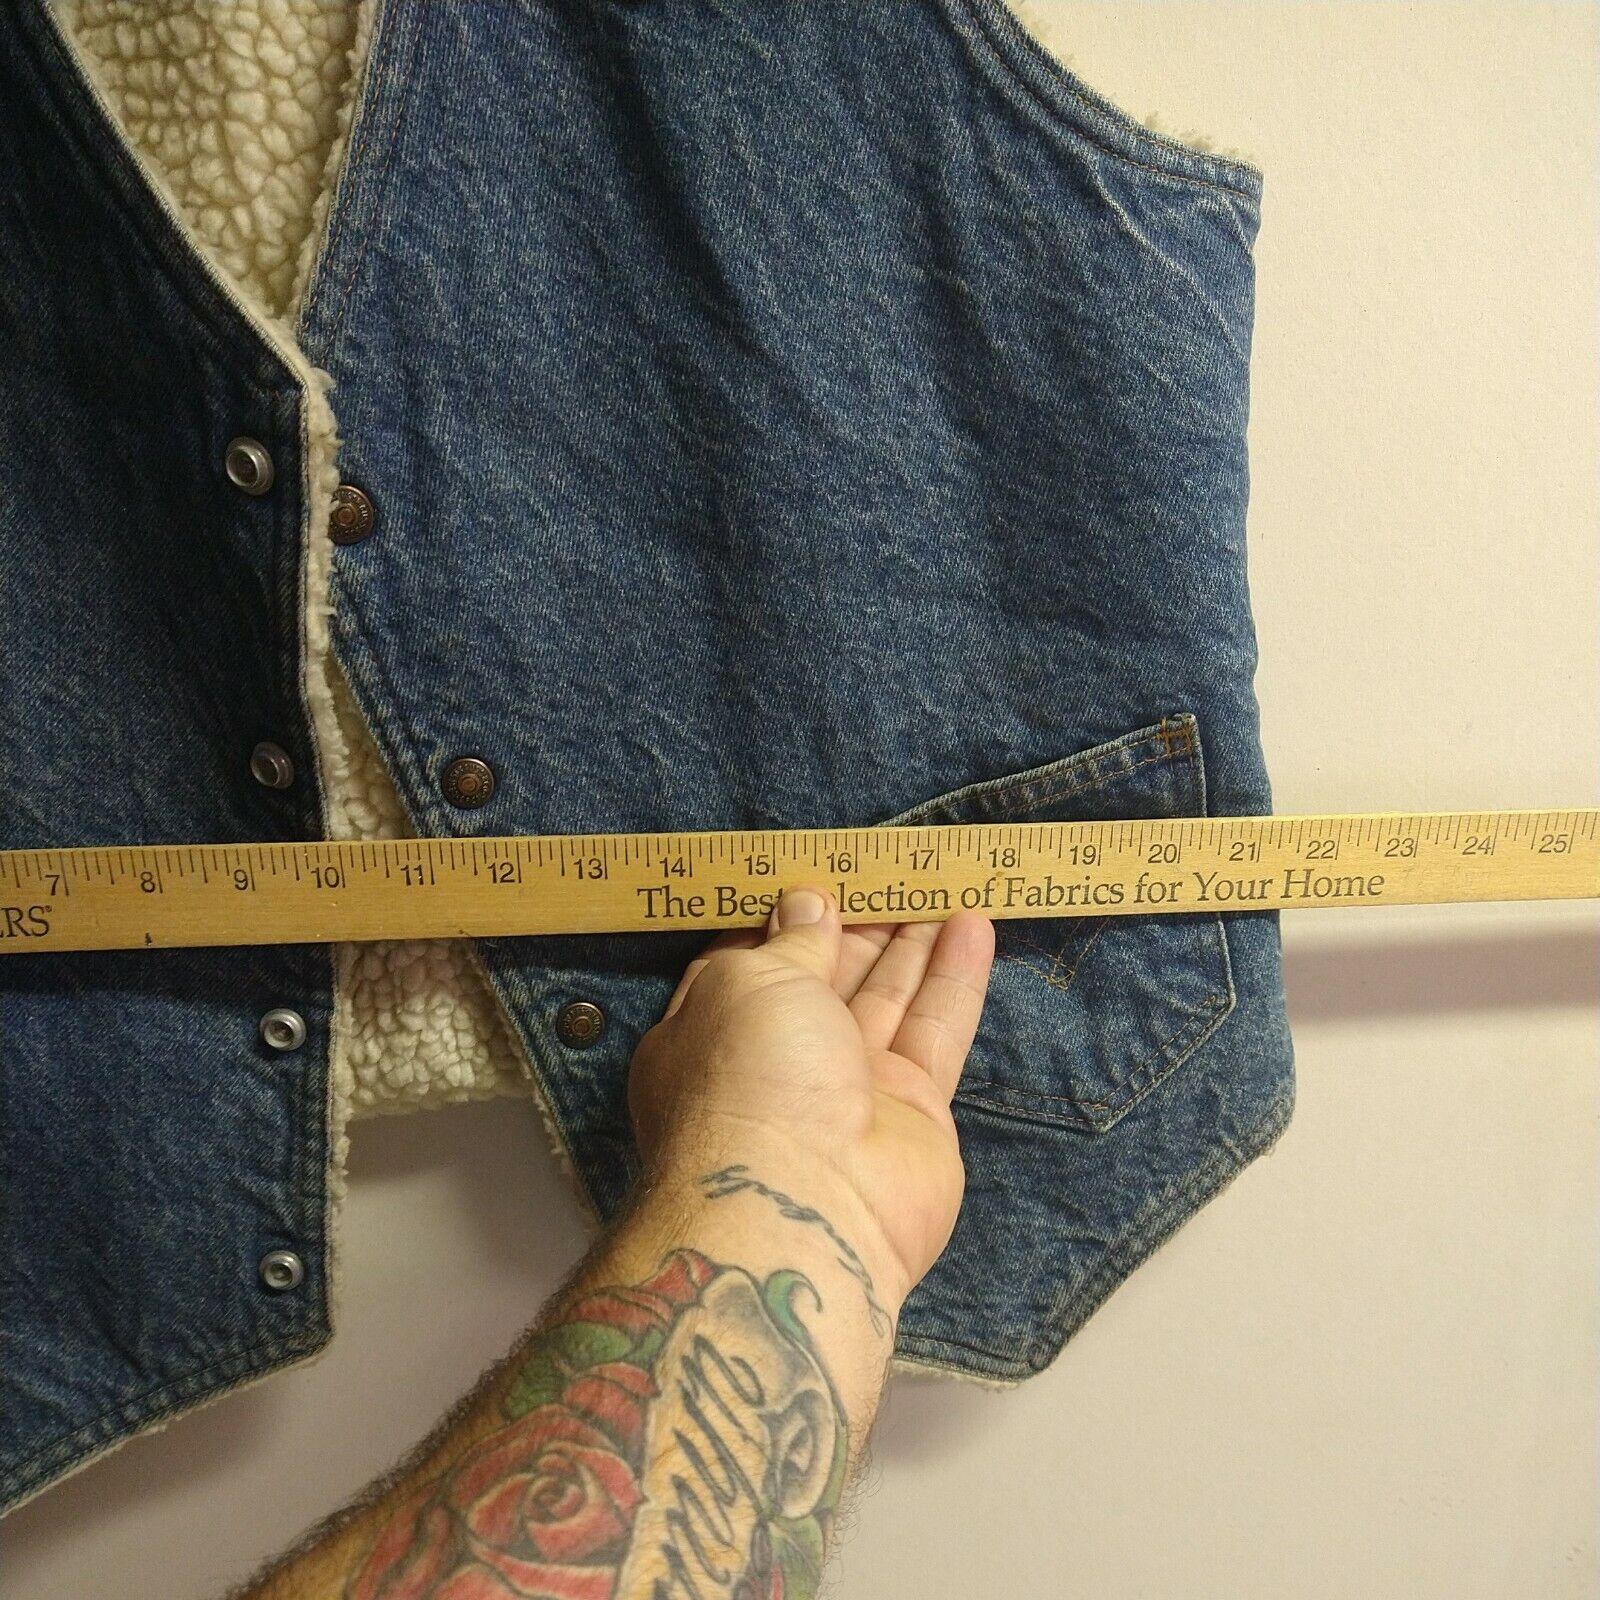 Levis vintage clothing Vest made in USA - image 6